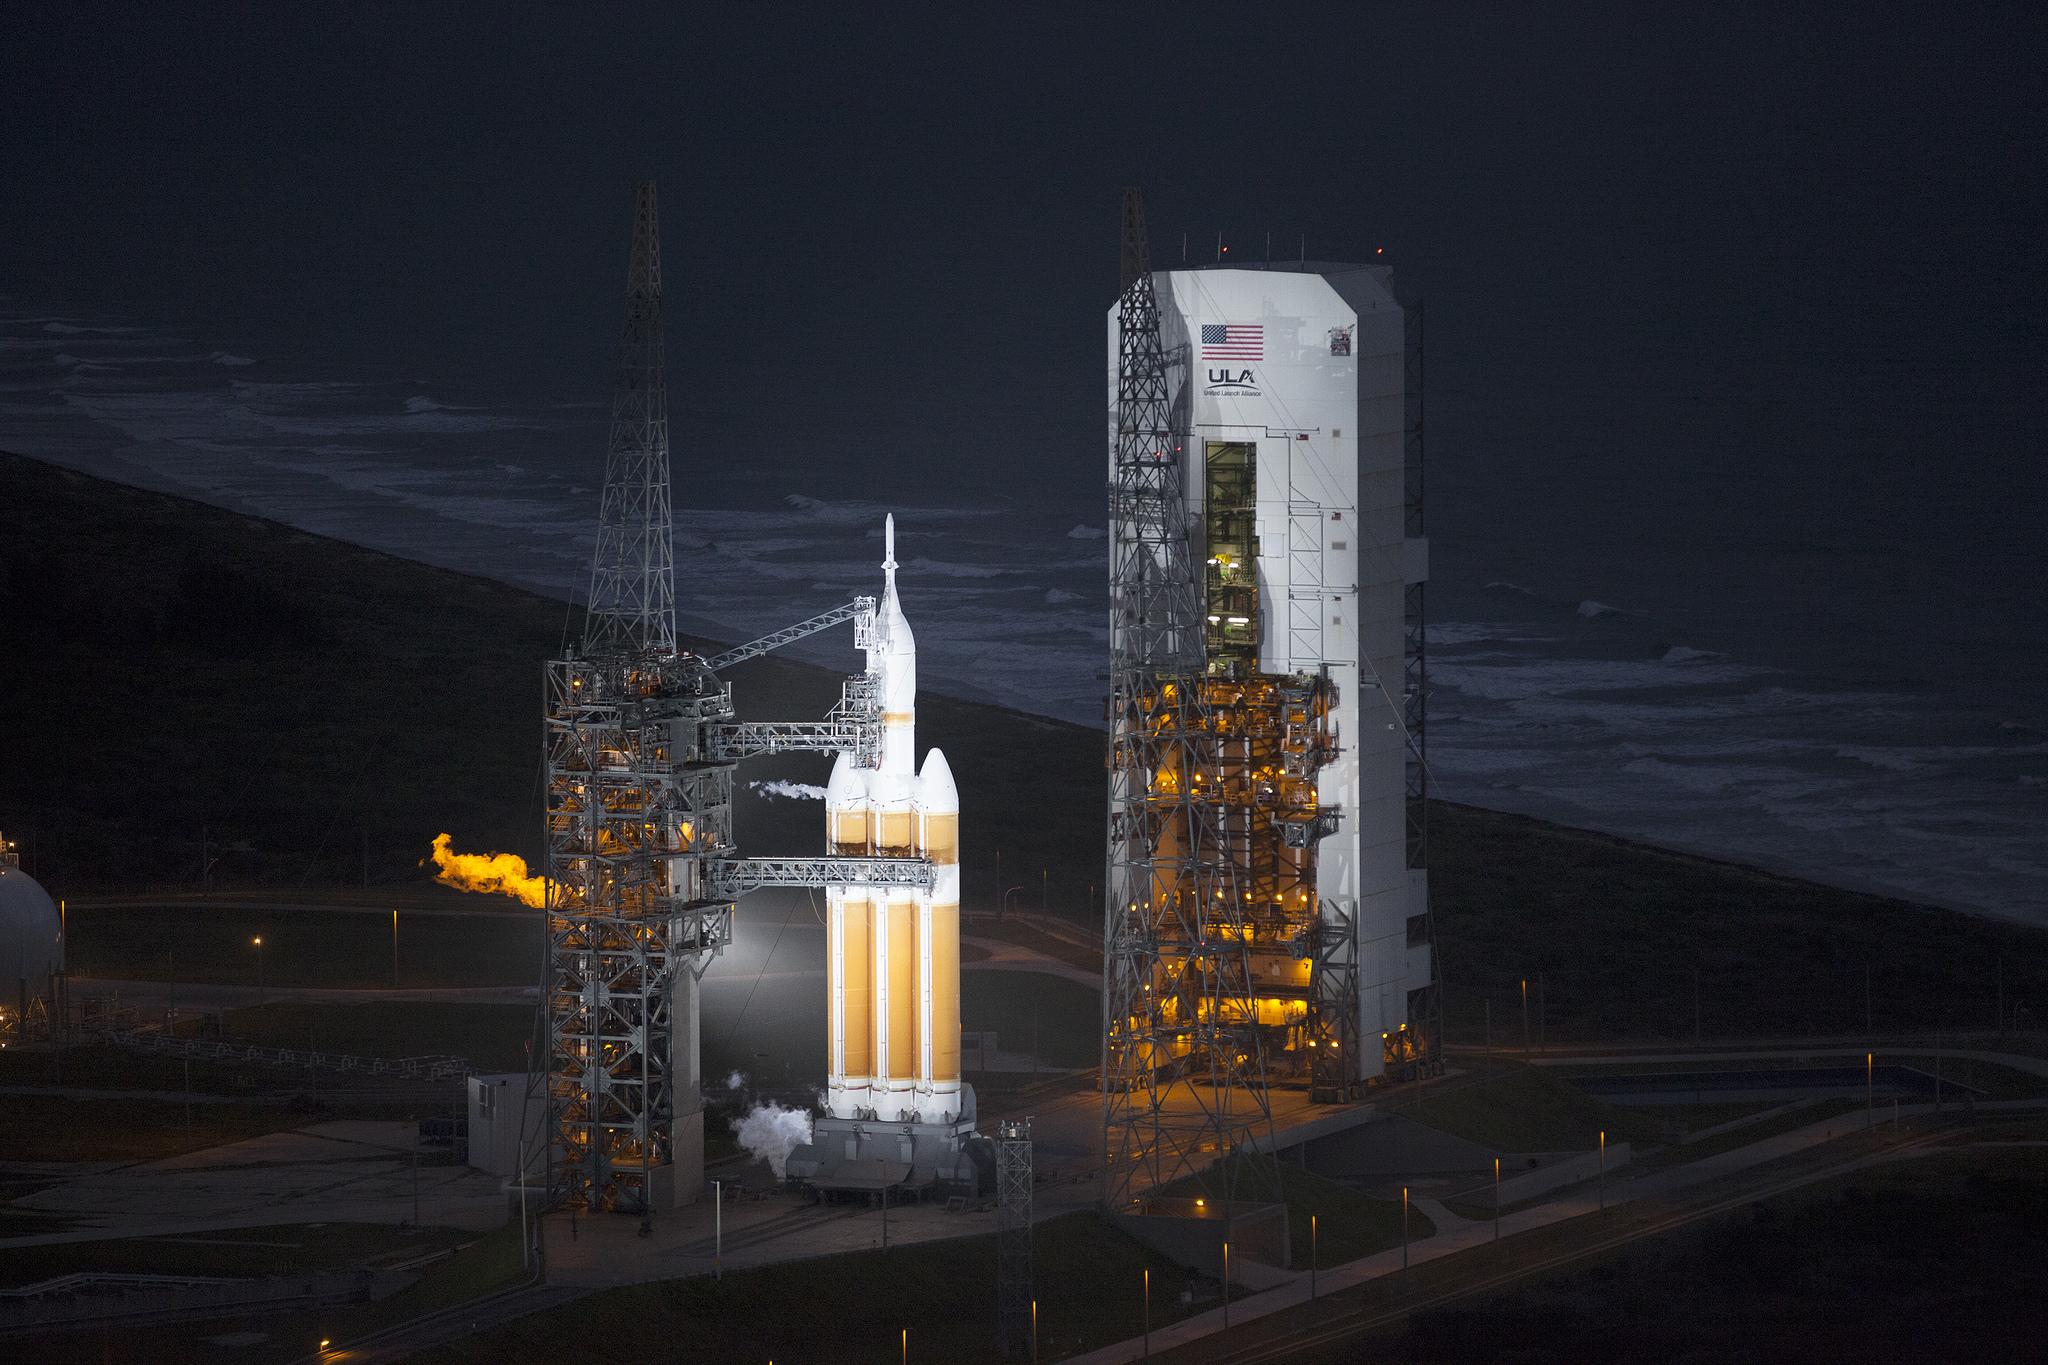 nasa orion rocket before lift off - photo #37